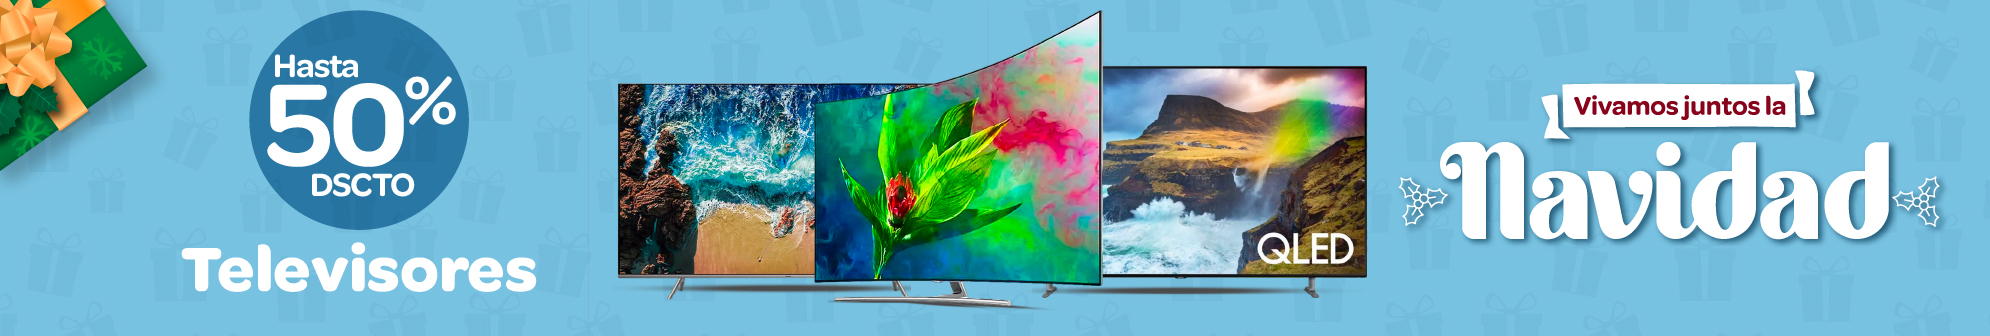 Banner TV